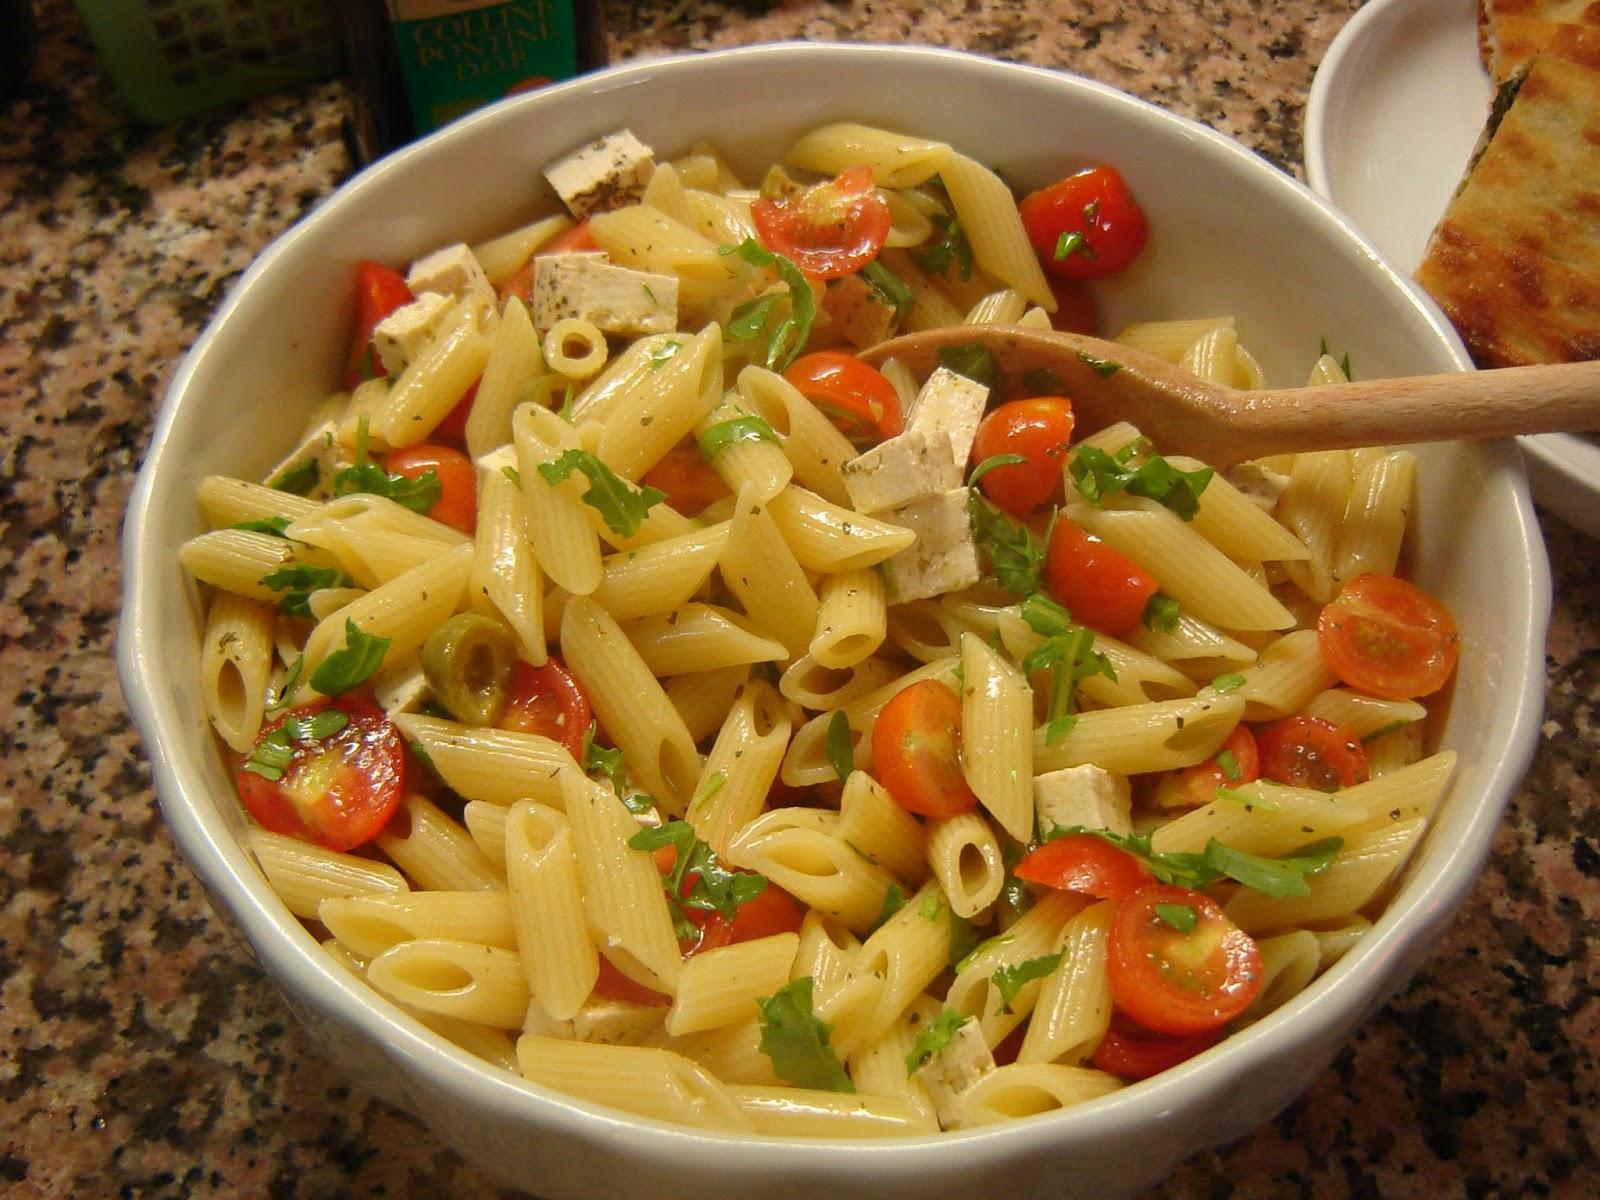 A la italiana ensalada fresca de pasta - Ensalada fresca de pasta ...